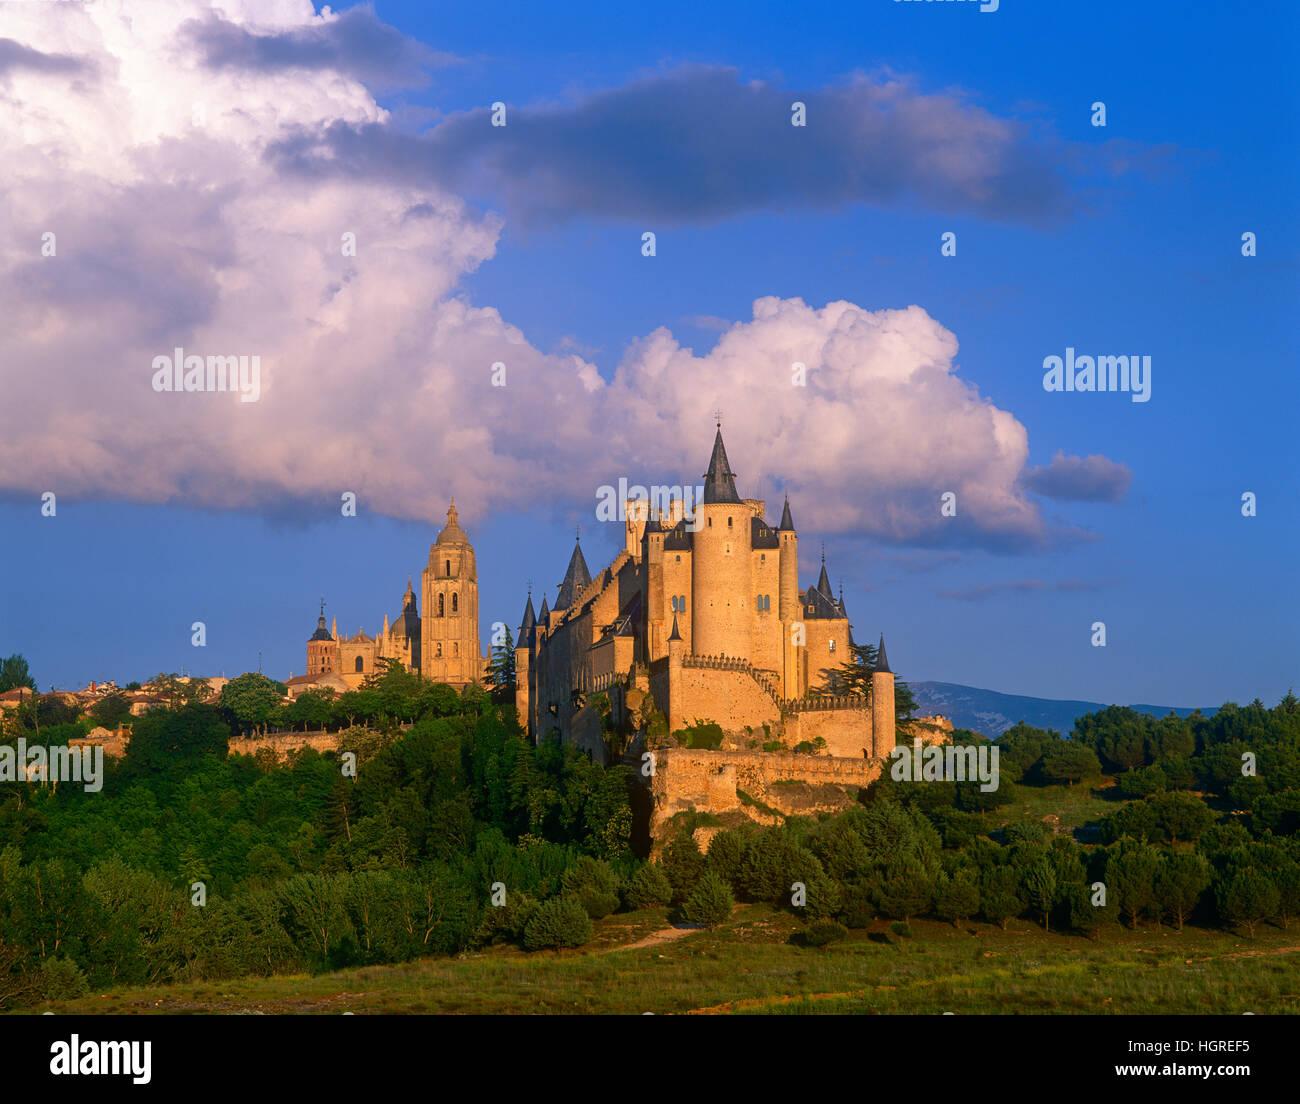 The Alcazar and Cathedral, Segovia, Castile y Lyon, Spain - Stock Image